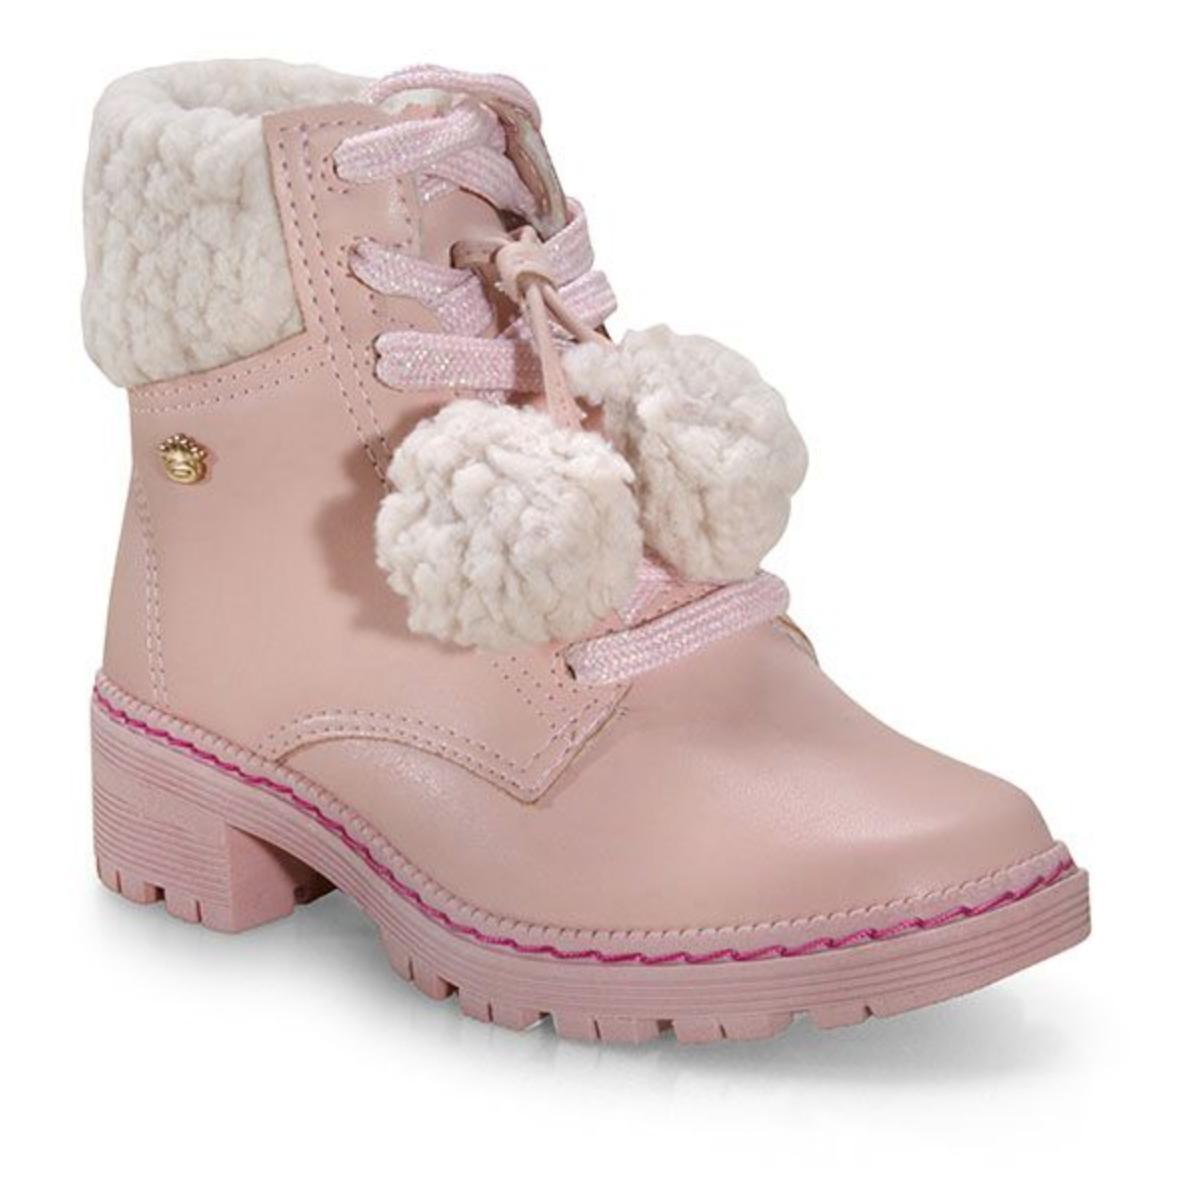 Bota Fem Infantil Pink Cats V1741 Quartzo/nude